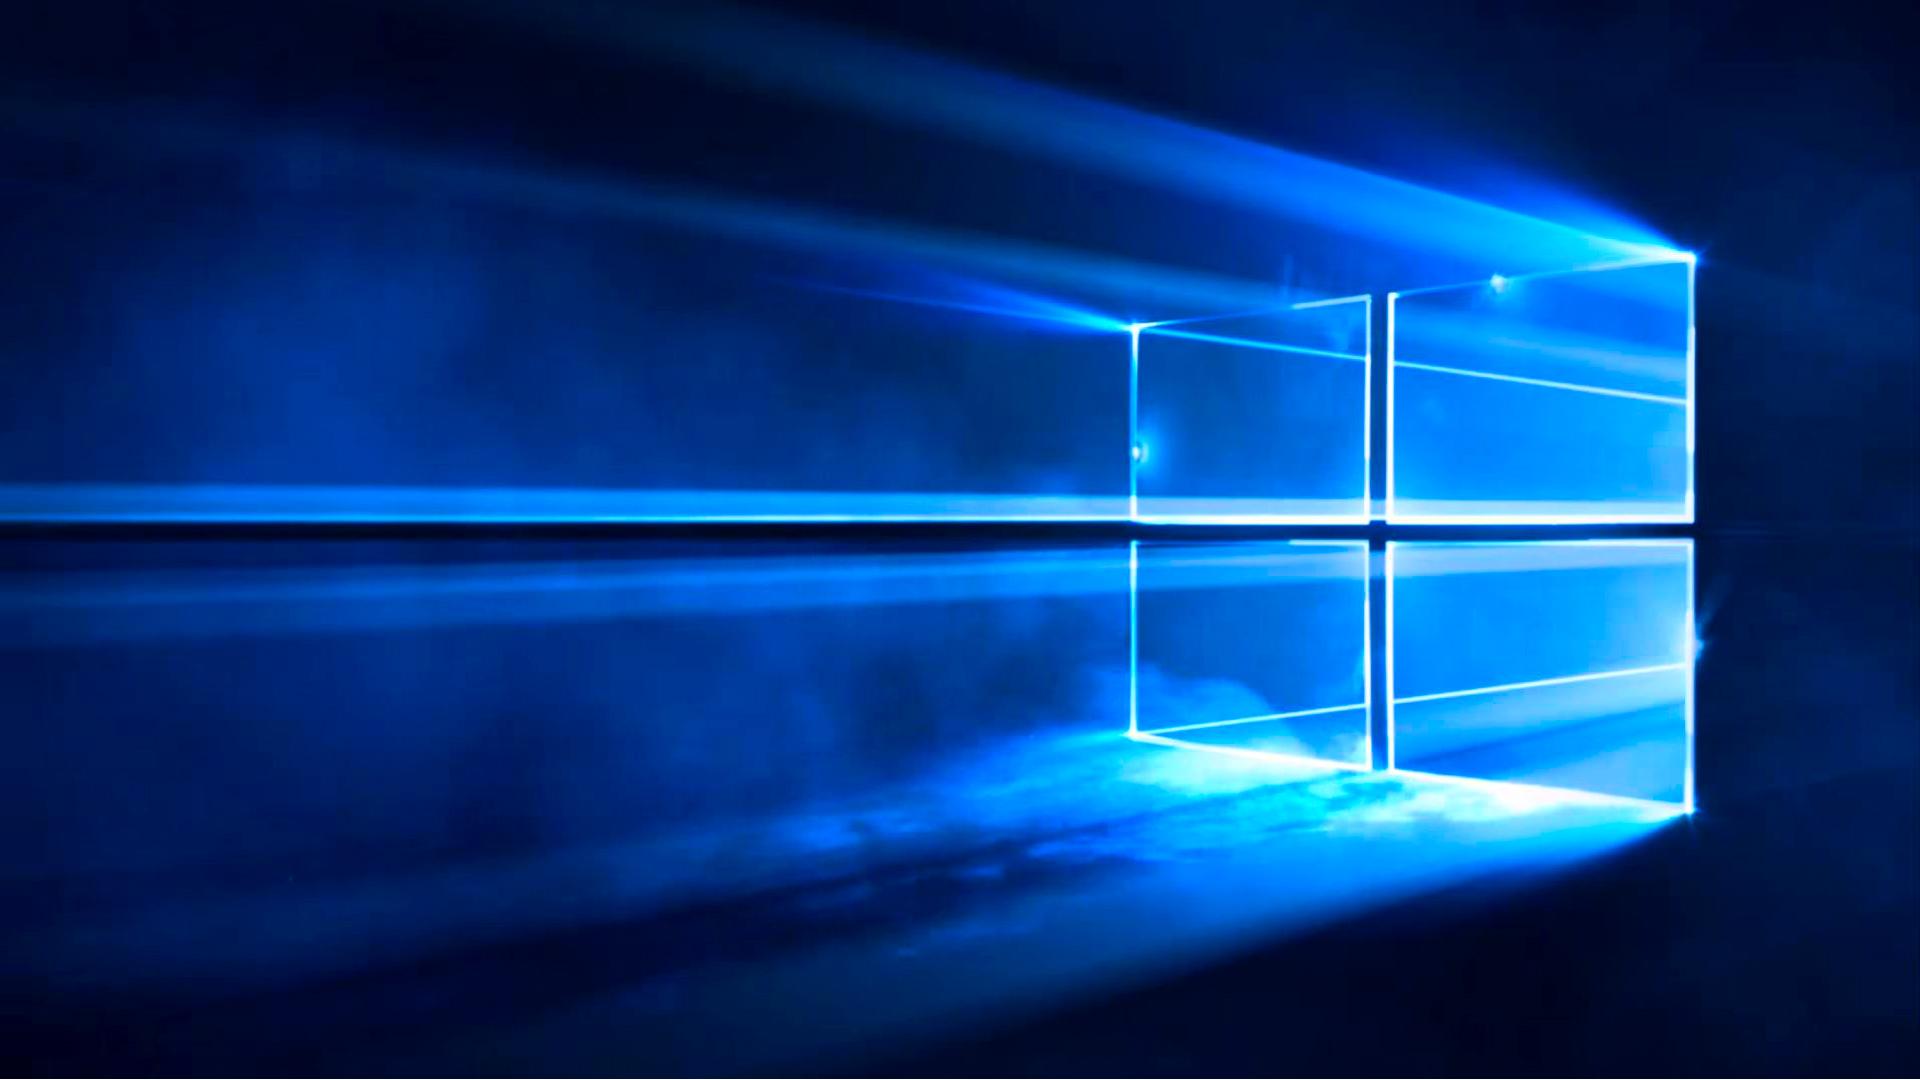 Microsoft Windows 10 Full HD Pics Wallpapers Attachment 15198 1920x1080